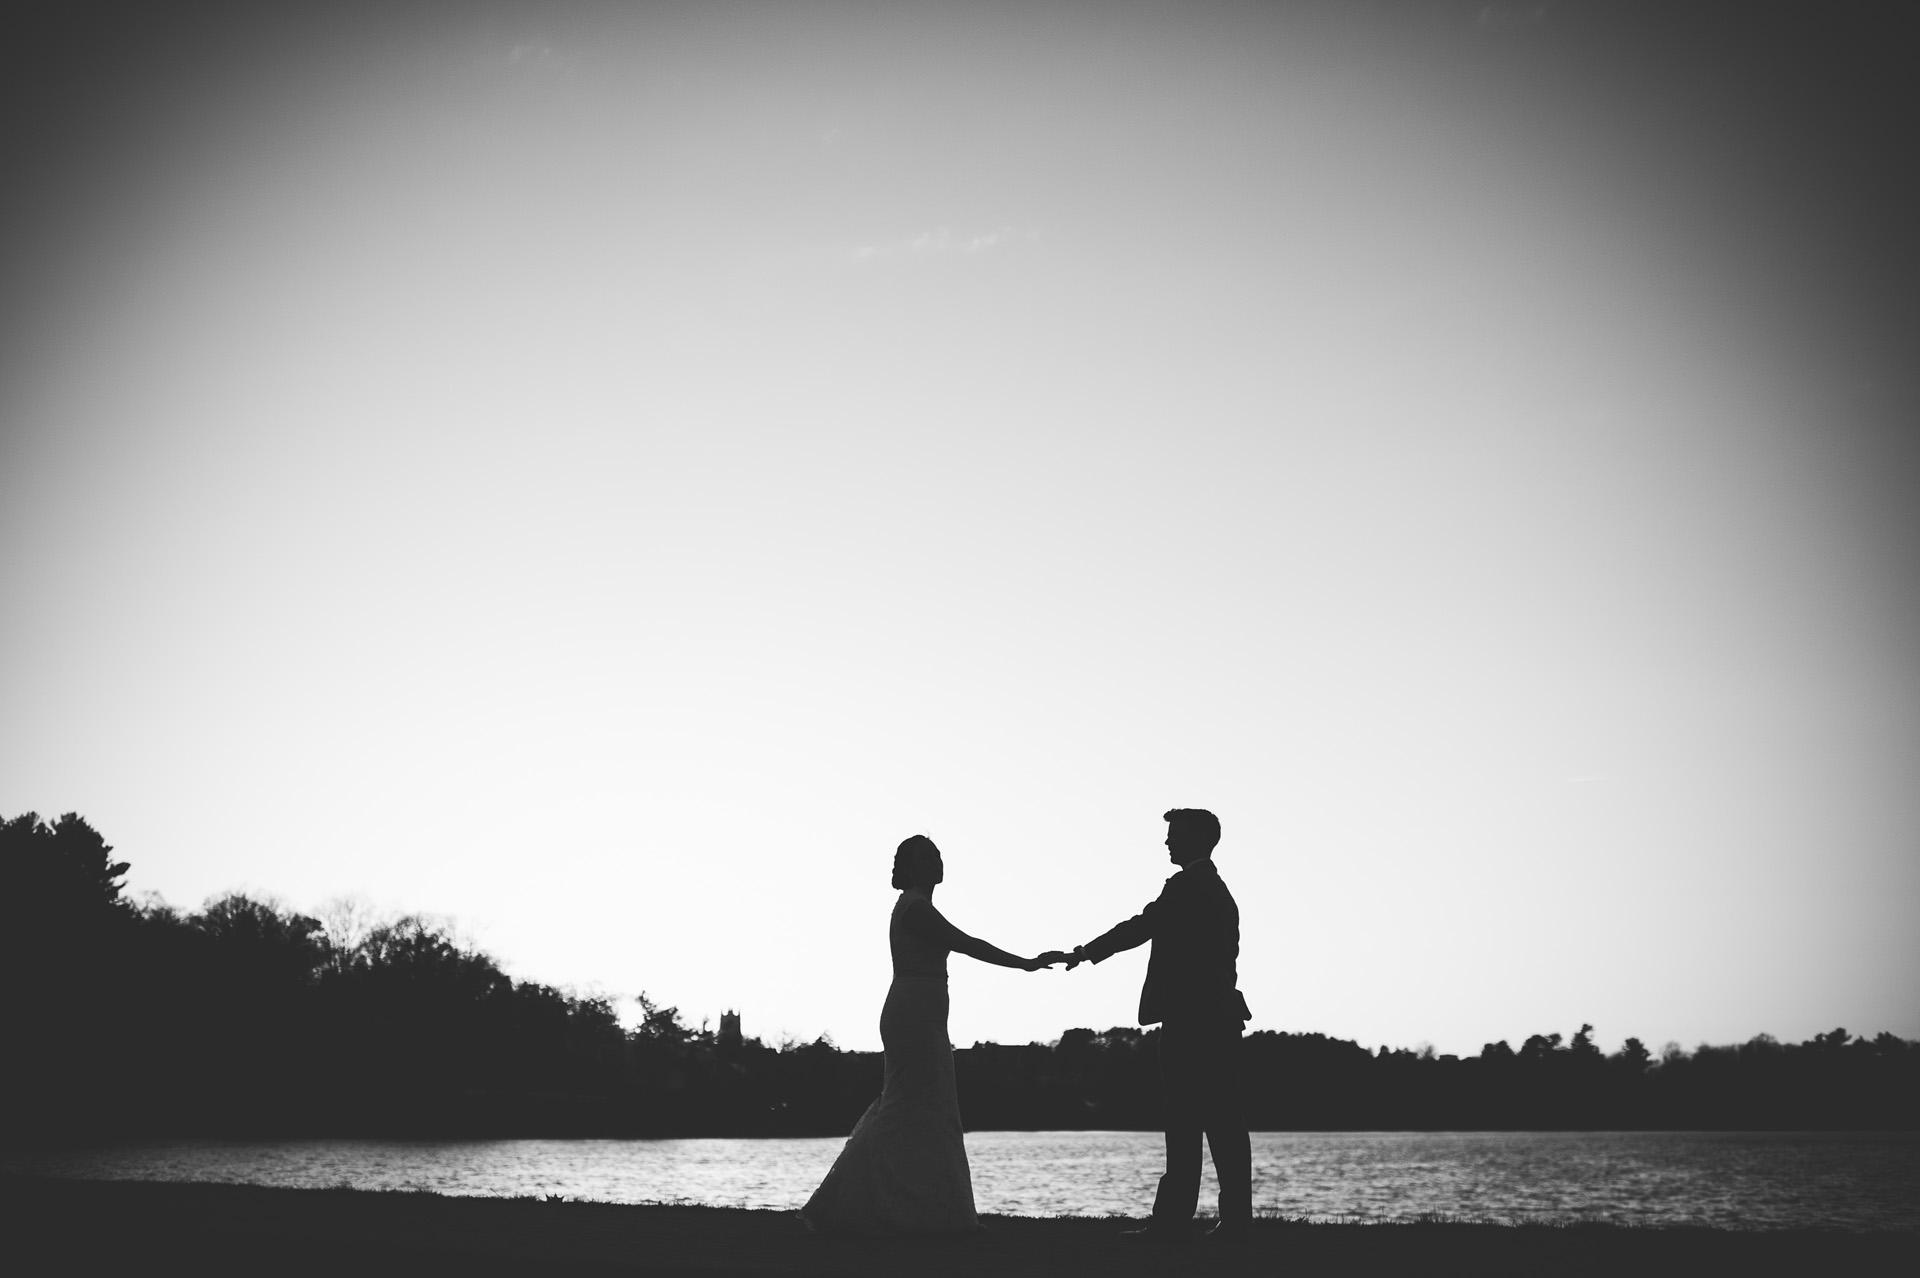 boston-waterworks-museum-wedding-430